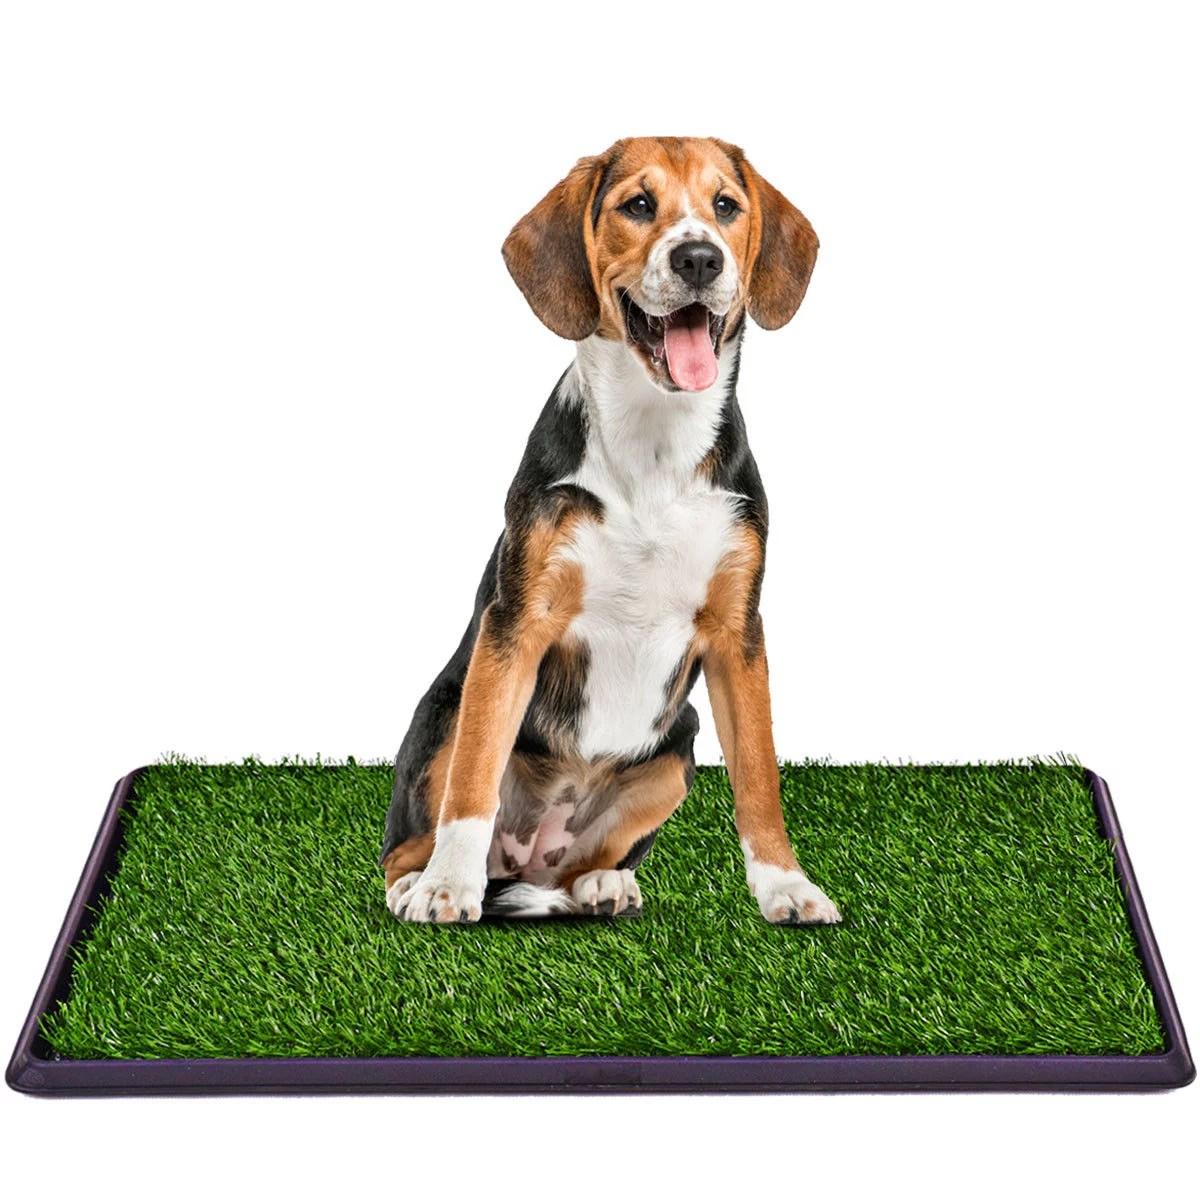 costway 30 x20 puppy pet potty training pee indoor toilet dog grass pad mat turf patch